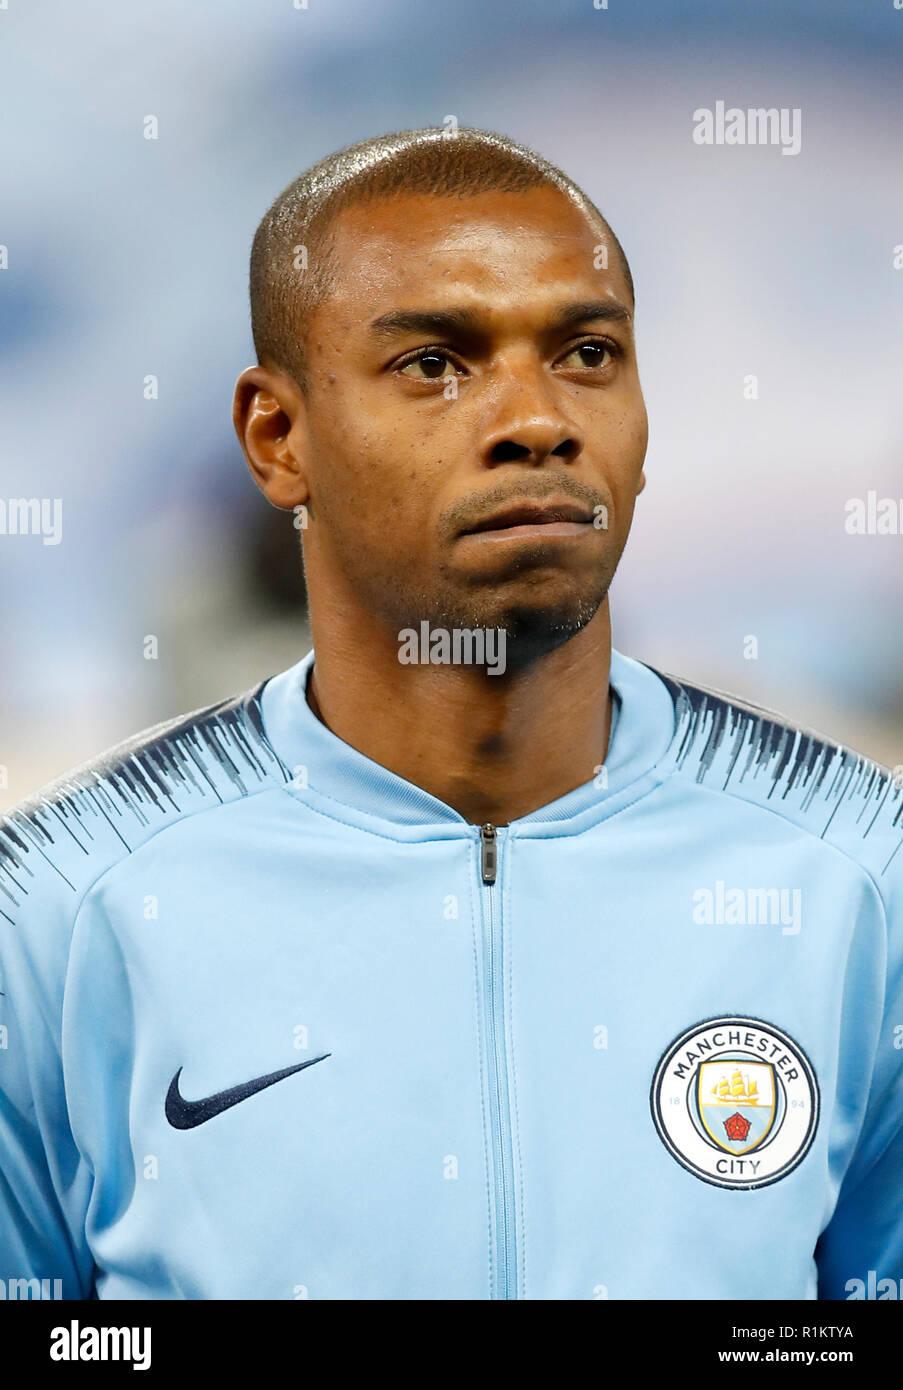 Manchester City's Fernandinho Stock Photo - Alamy